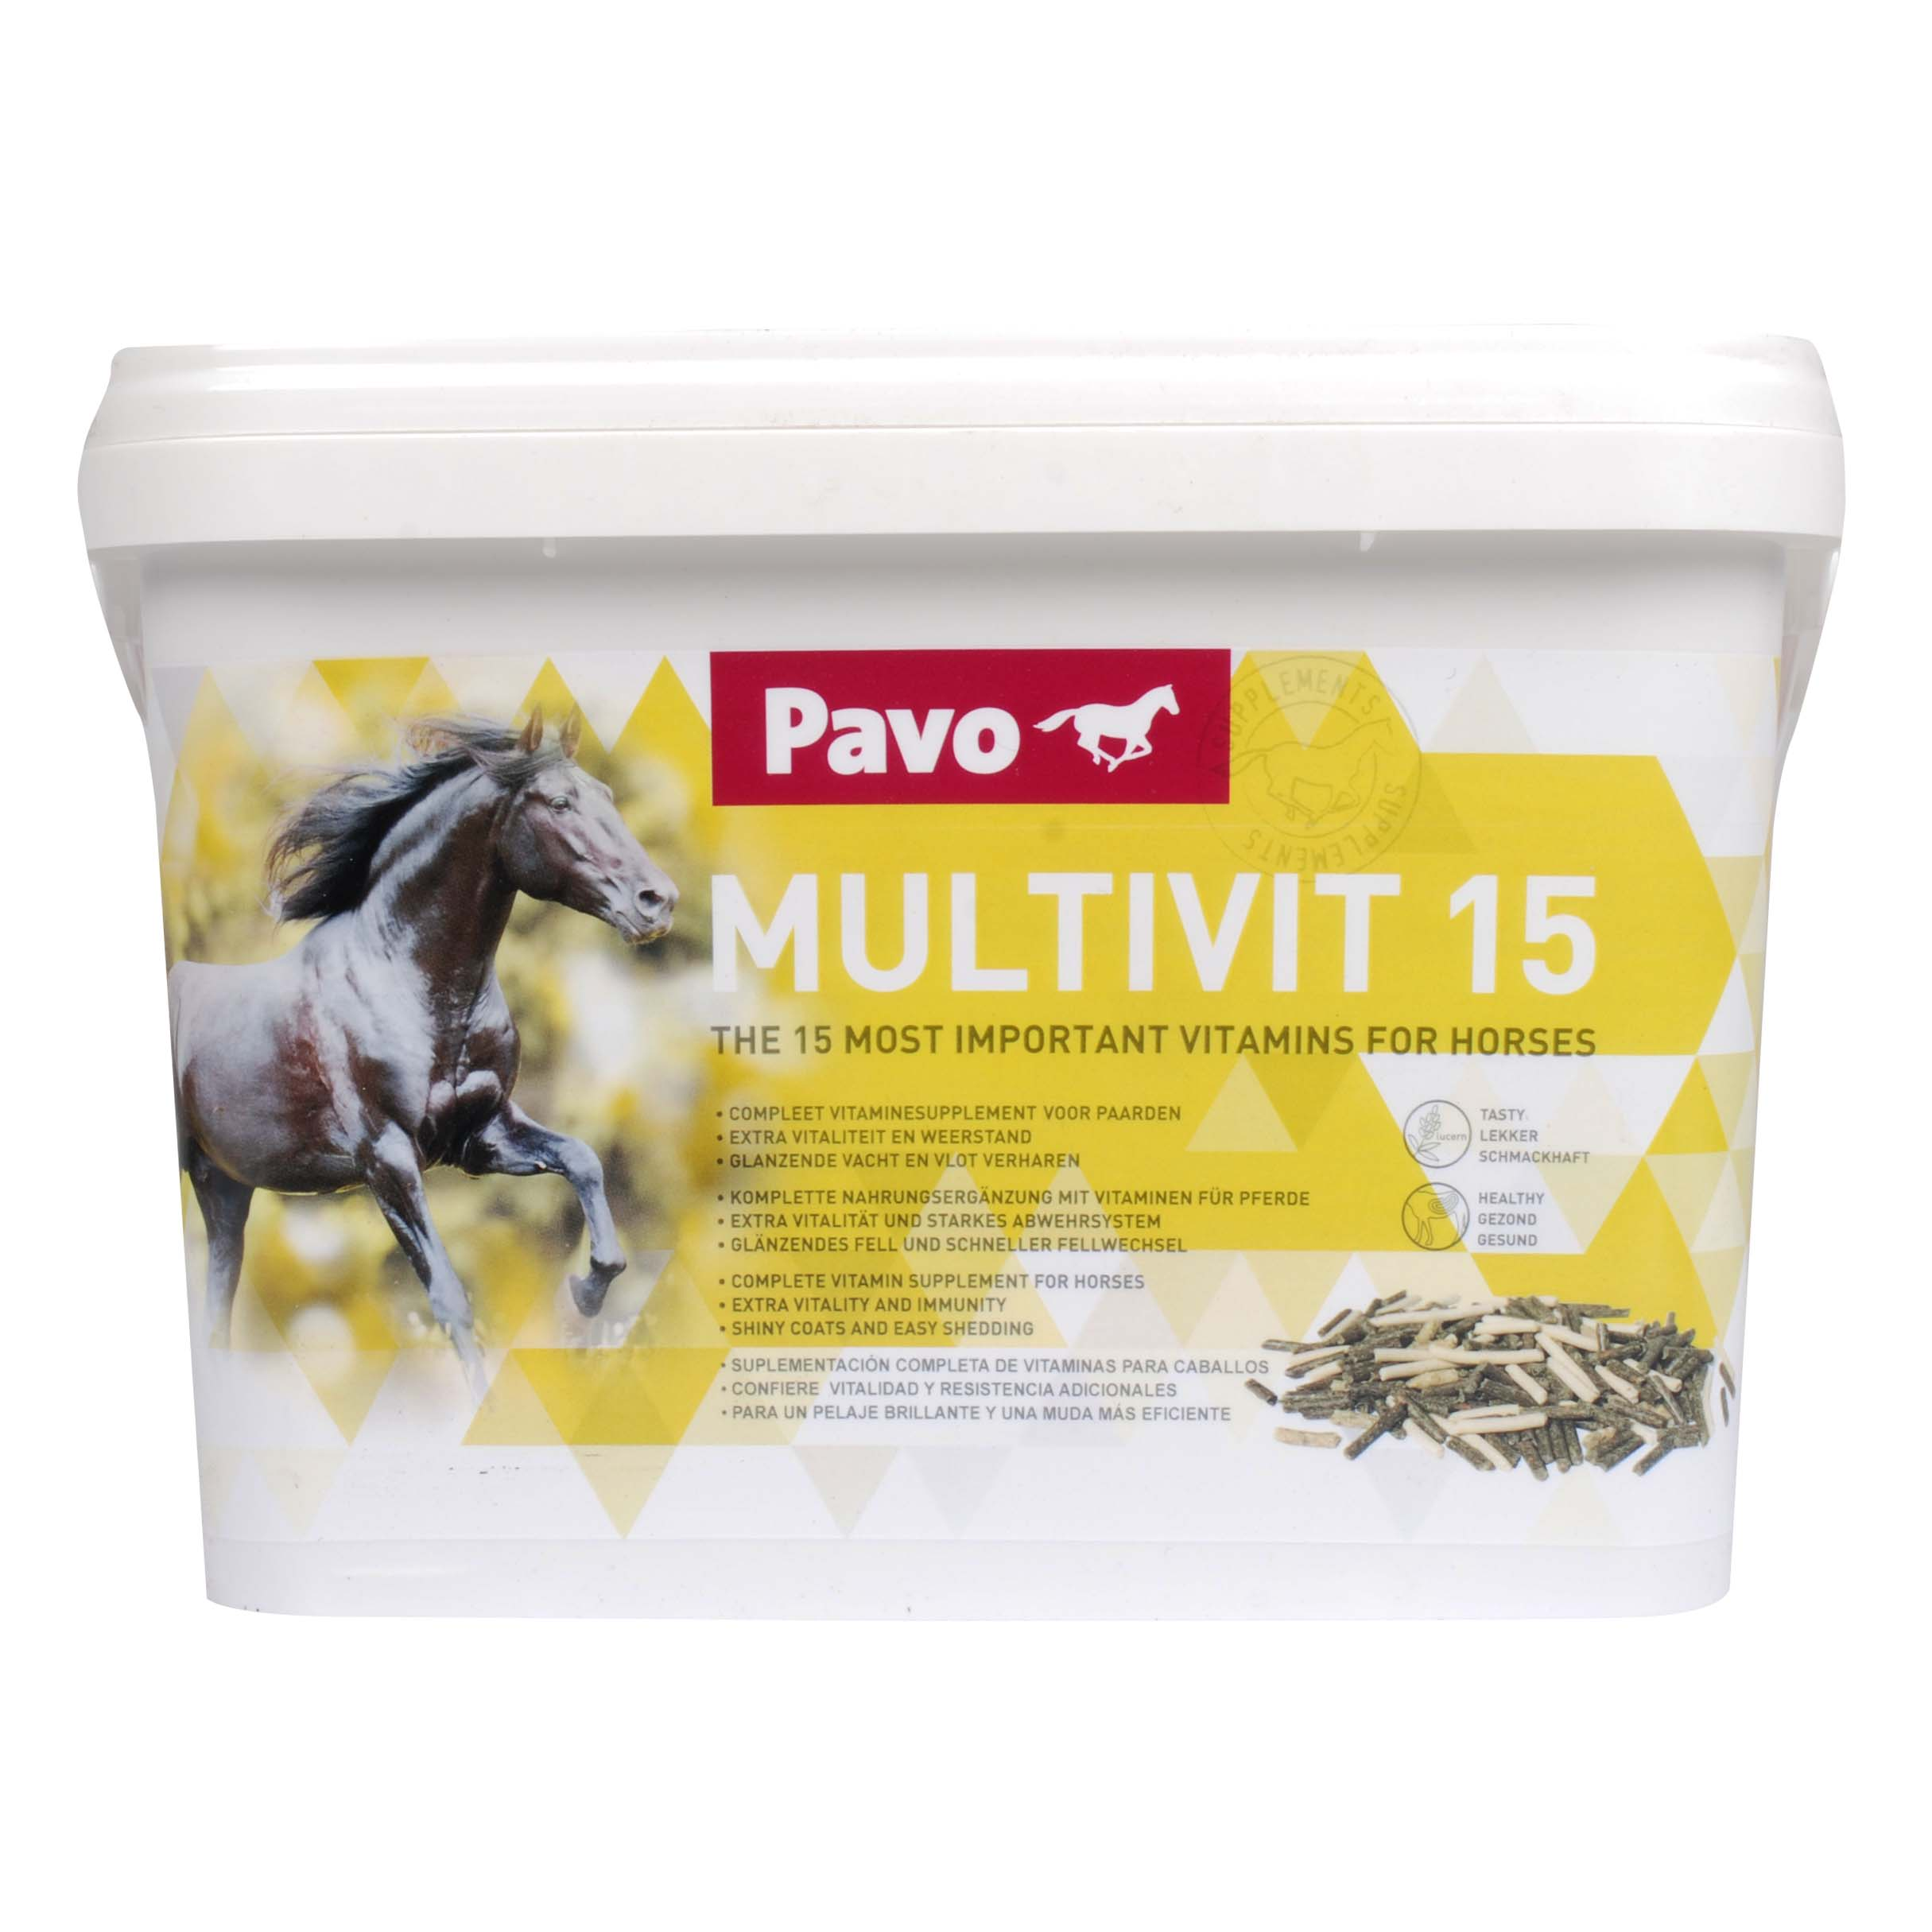 Pavo Multivit 15 - 3 kg